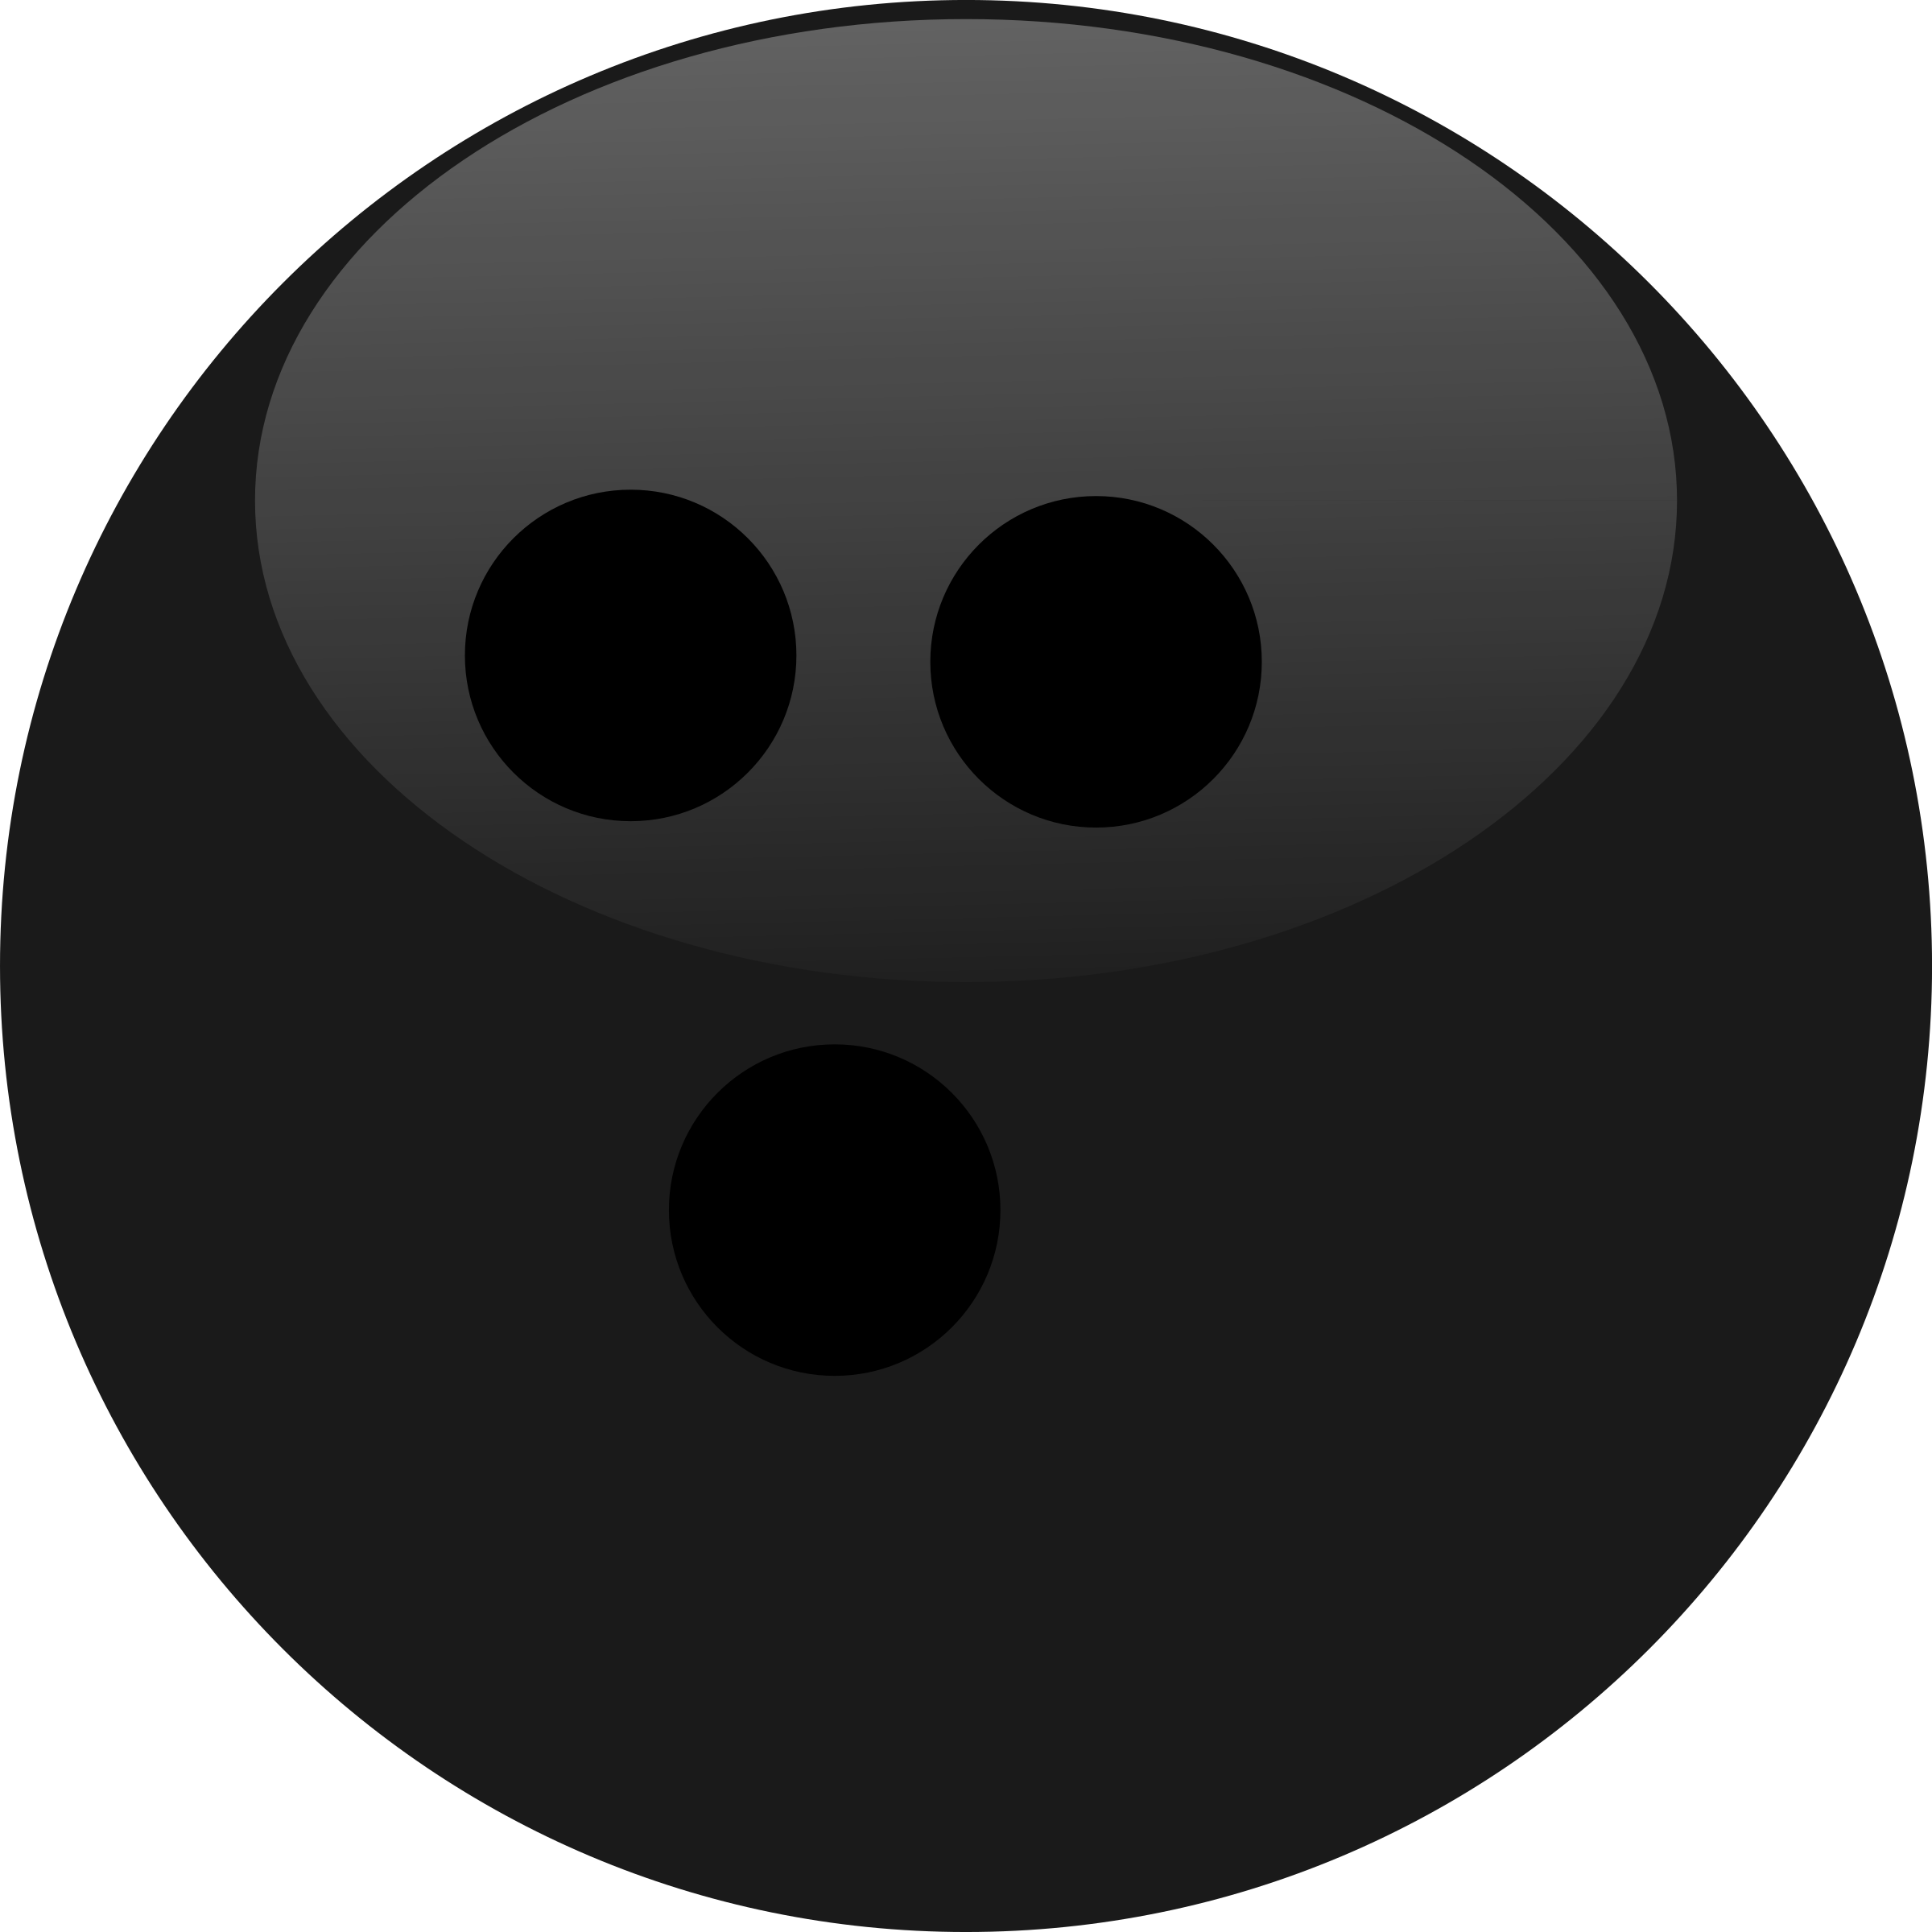 Bowling clipart symbol. Ball big image png